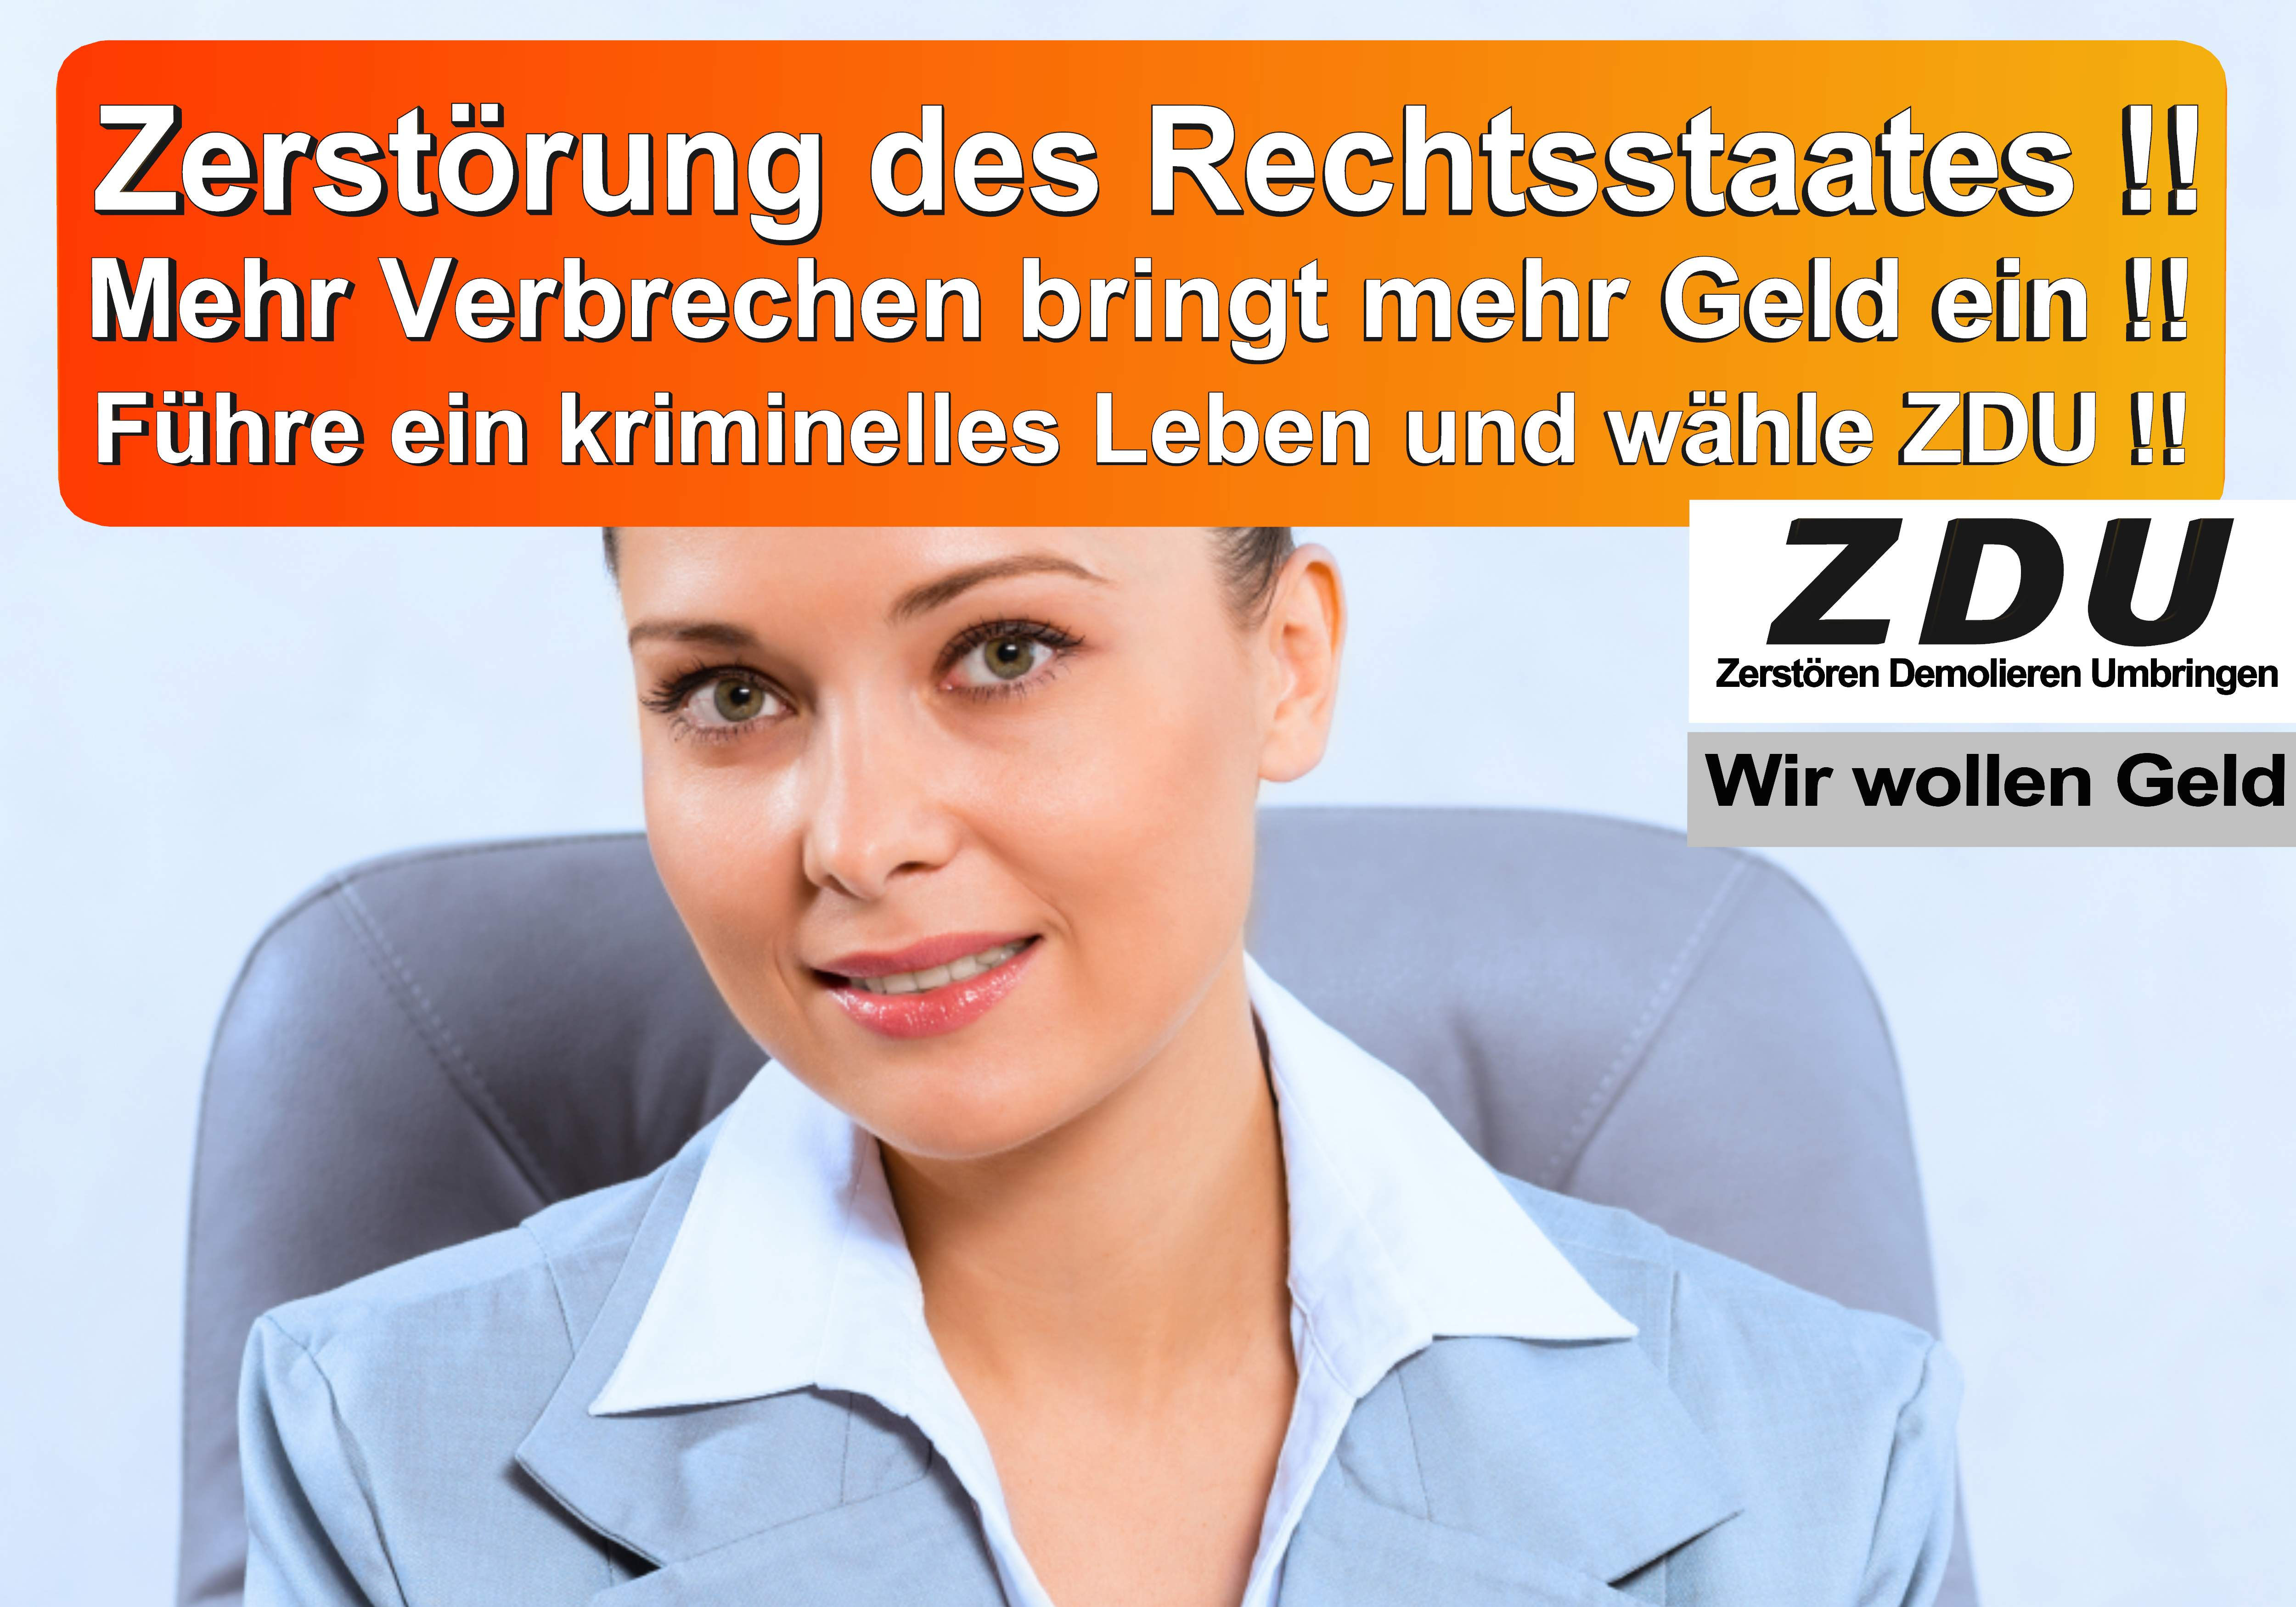 Bundestagswahl 2017 CDU SPD AfD Wahlplakat Angela Merkel CDU CSU (2)